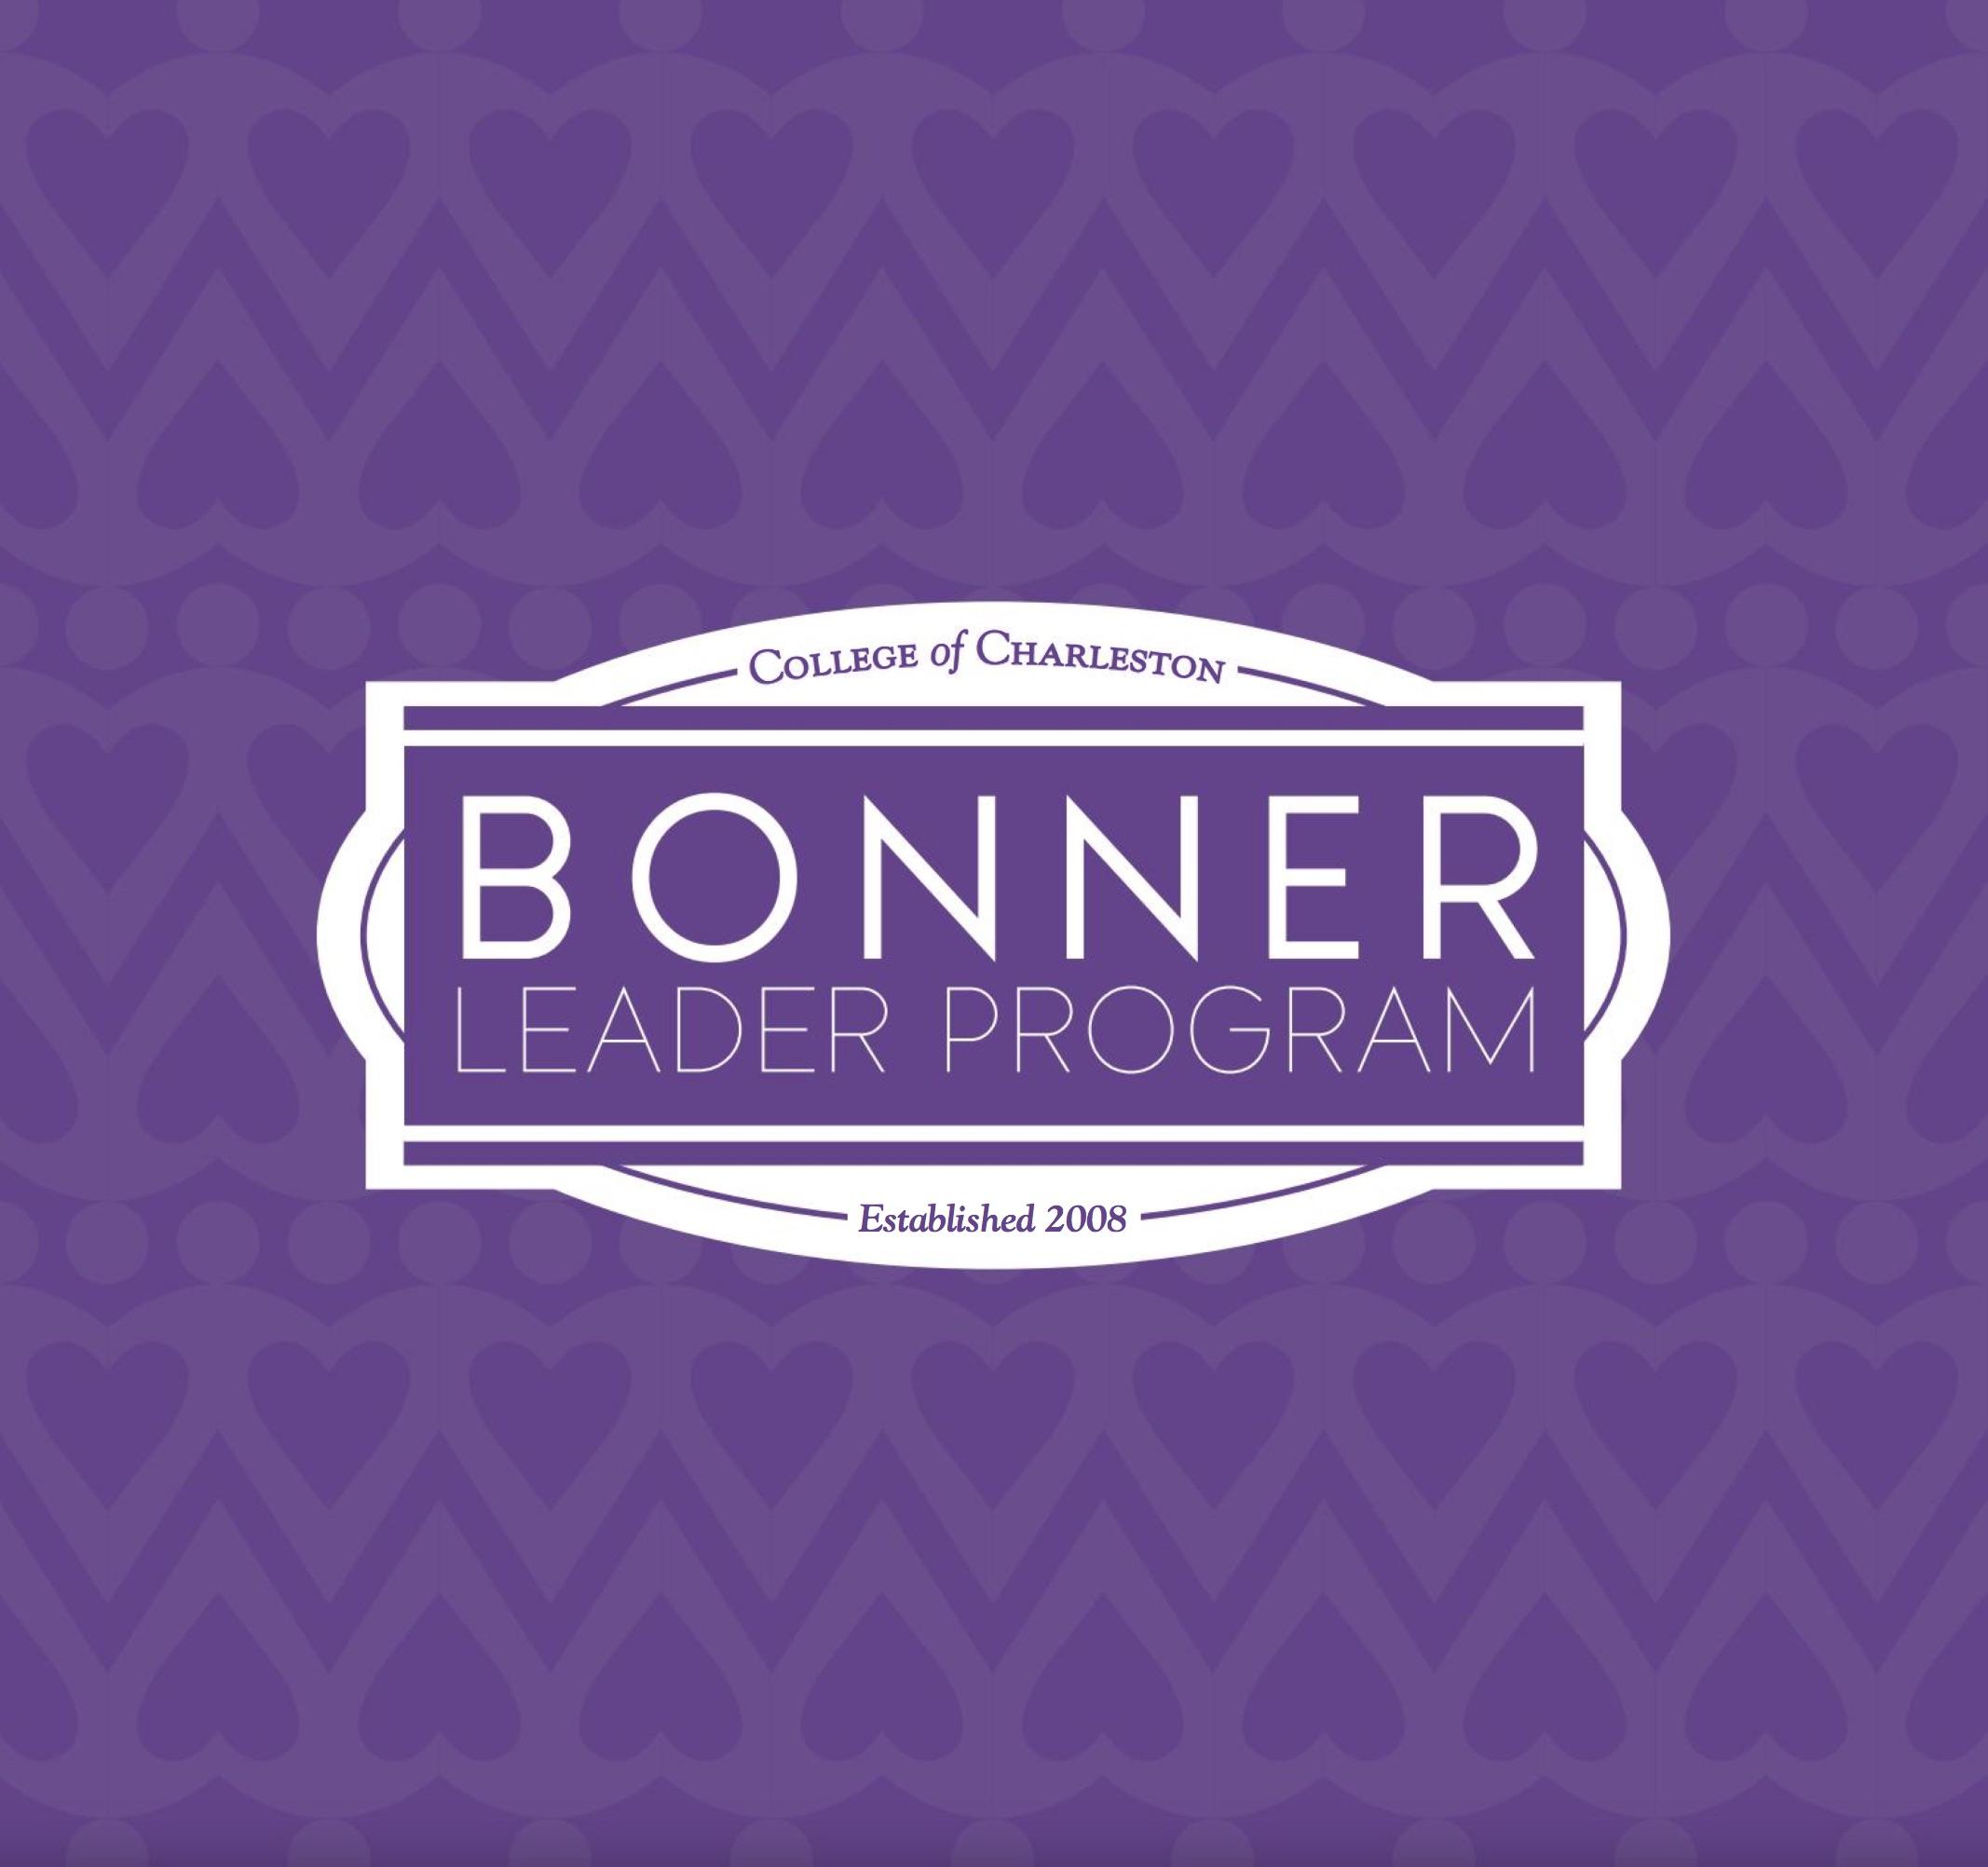 CofC_Bonner_Book_cover.jpg